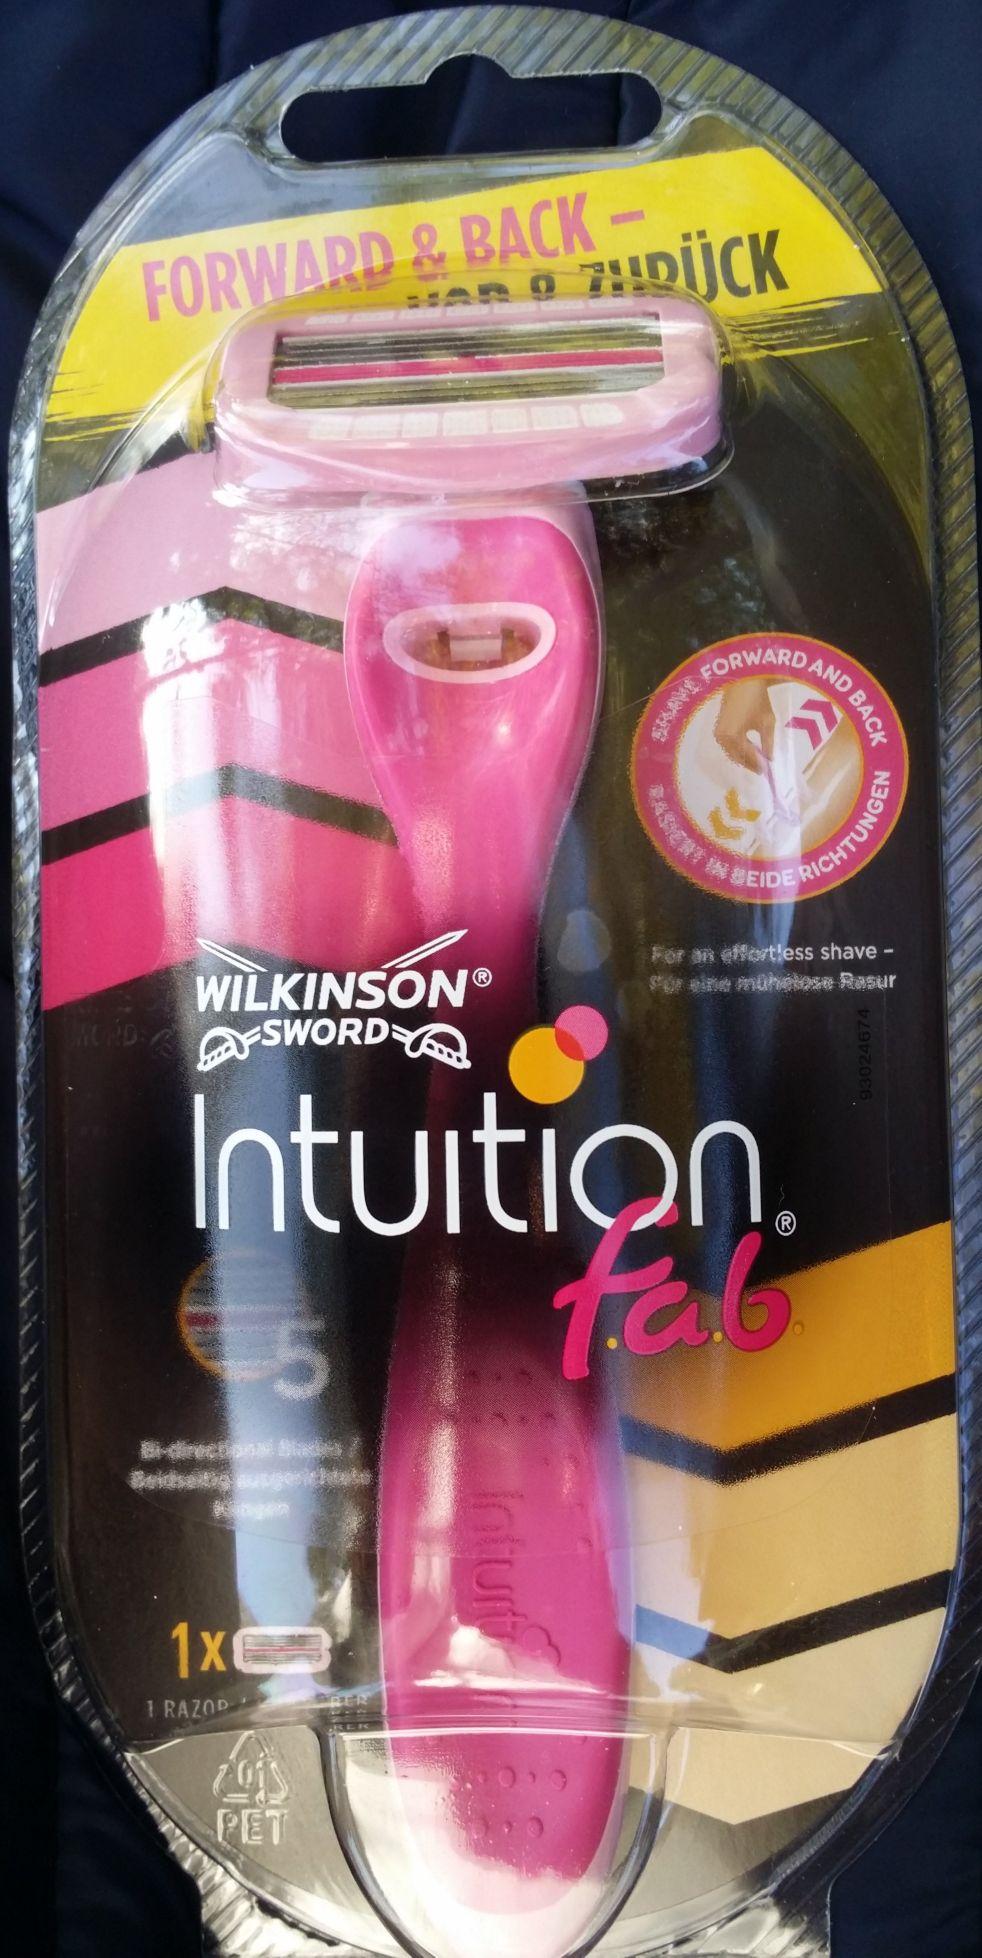 Wilkinson Intuition f.a.b. endlos Freebie durch Kassenfehler/ Couponfehler im Kassensystem